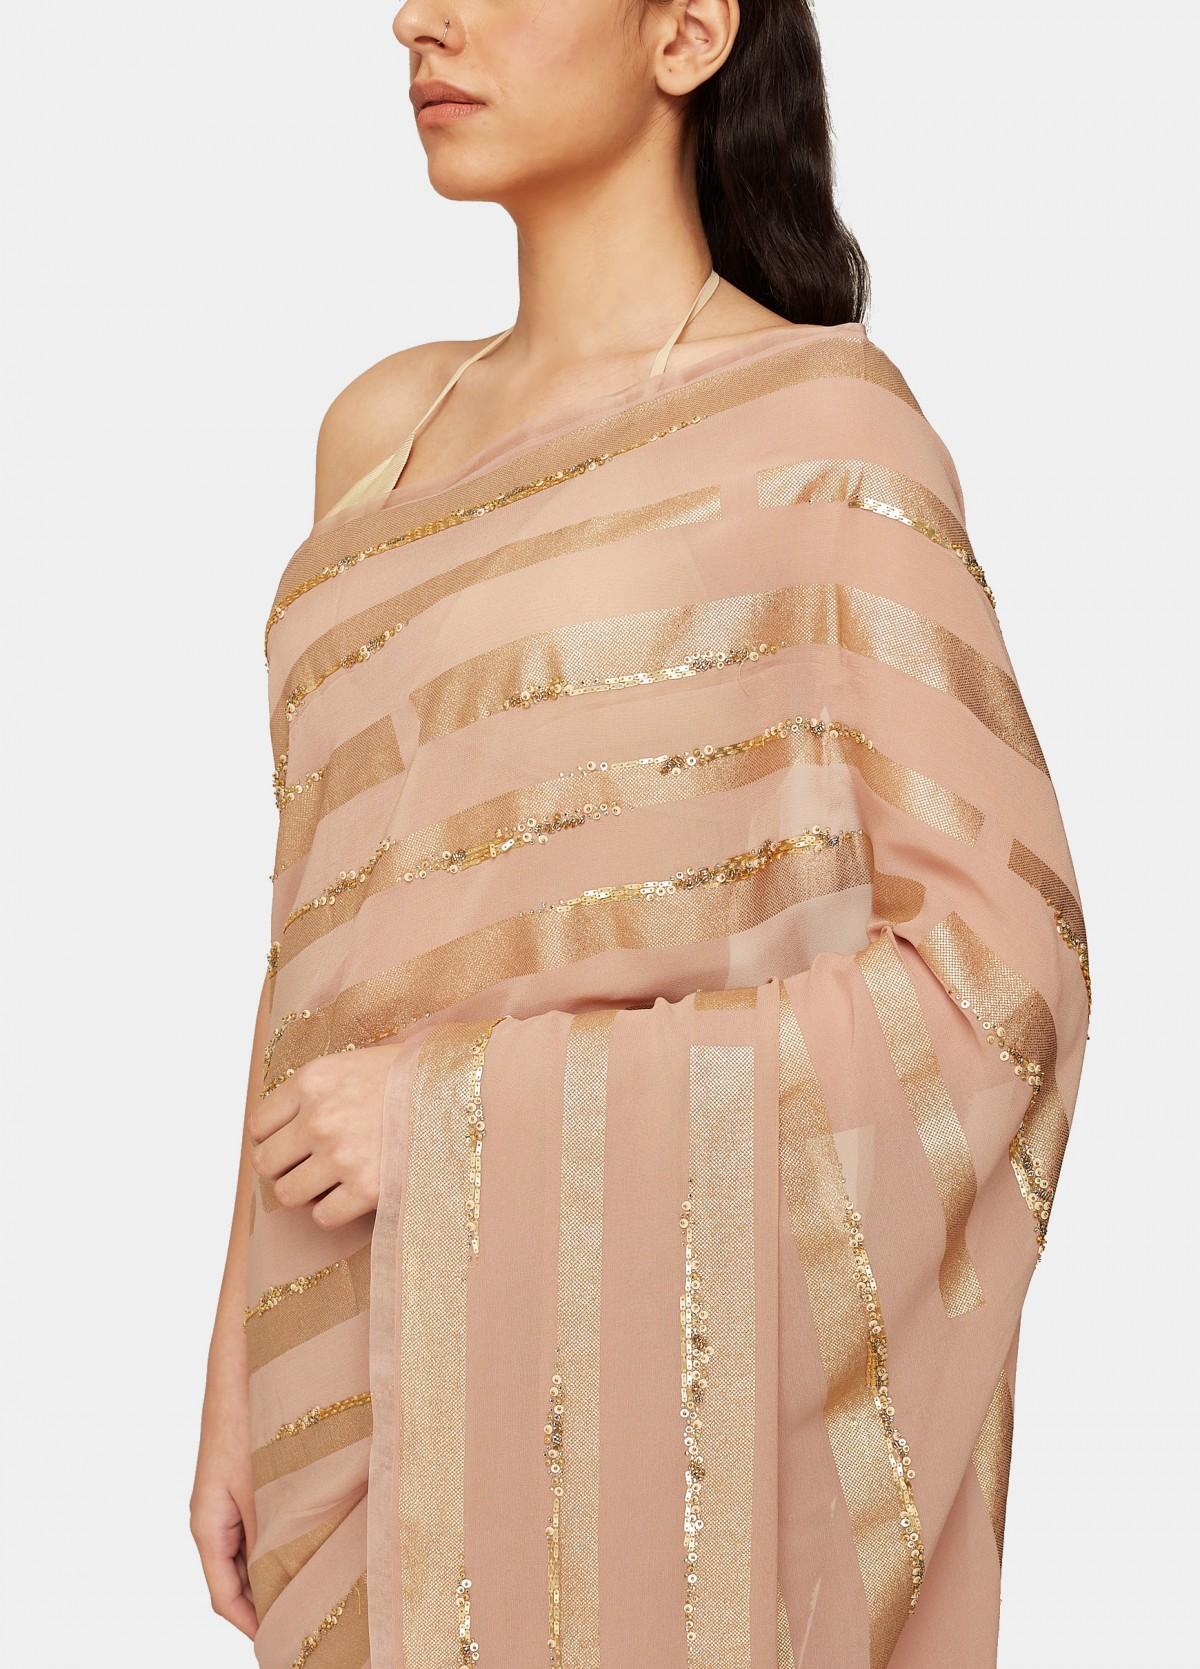 The Razzel Dazzel Sari